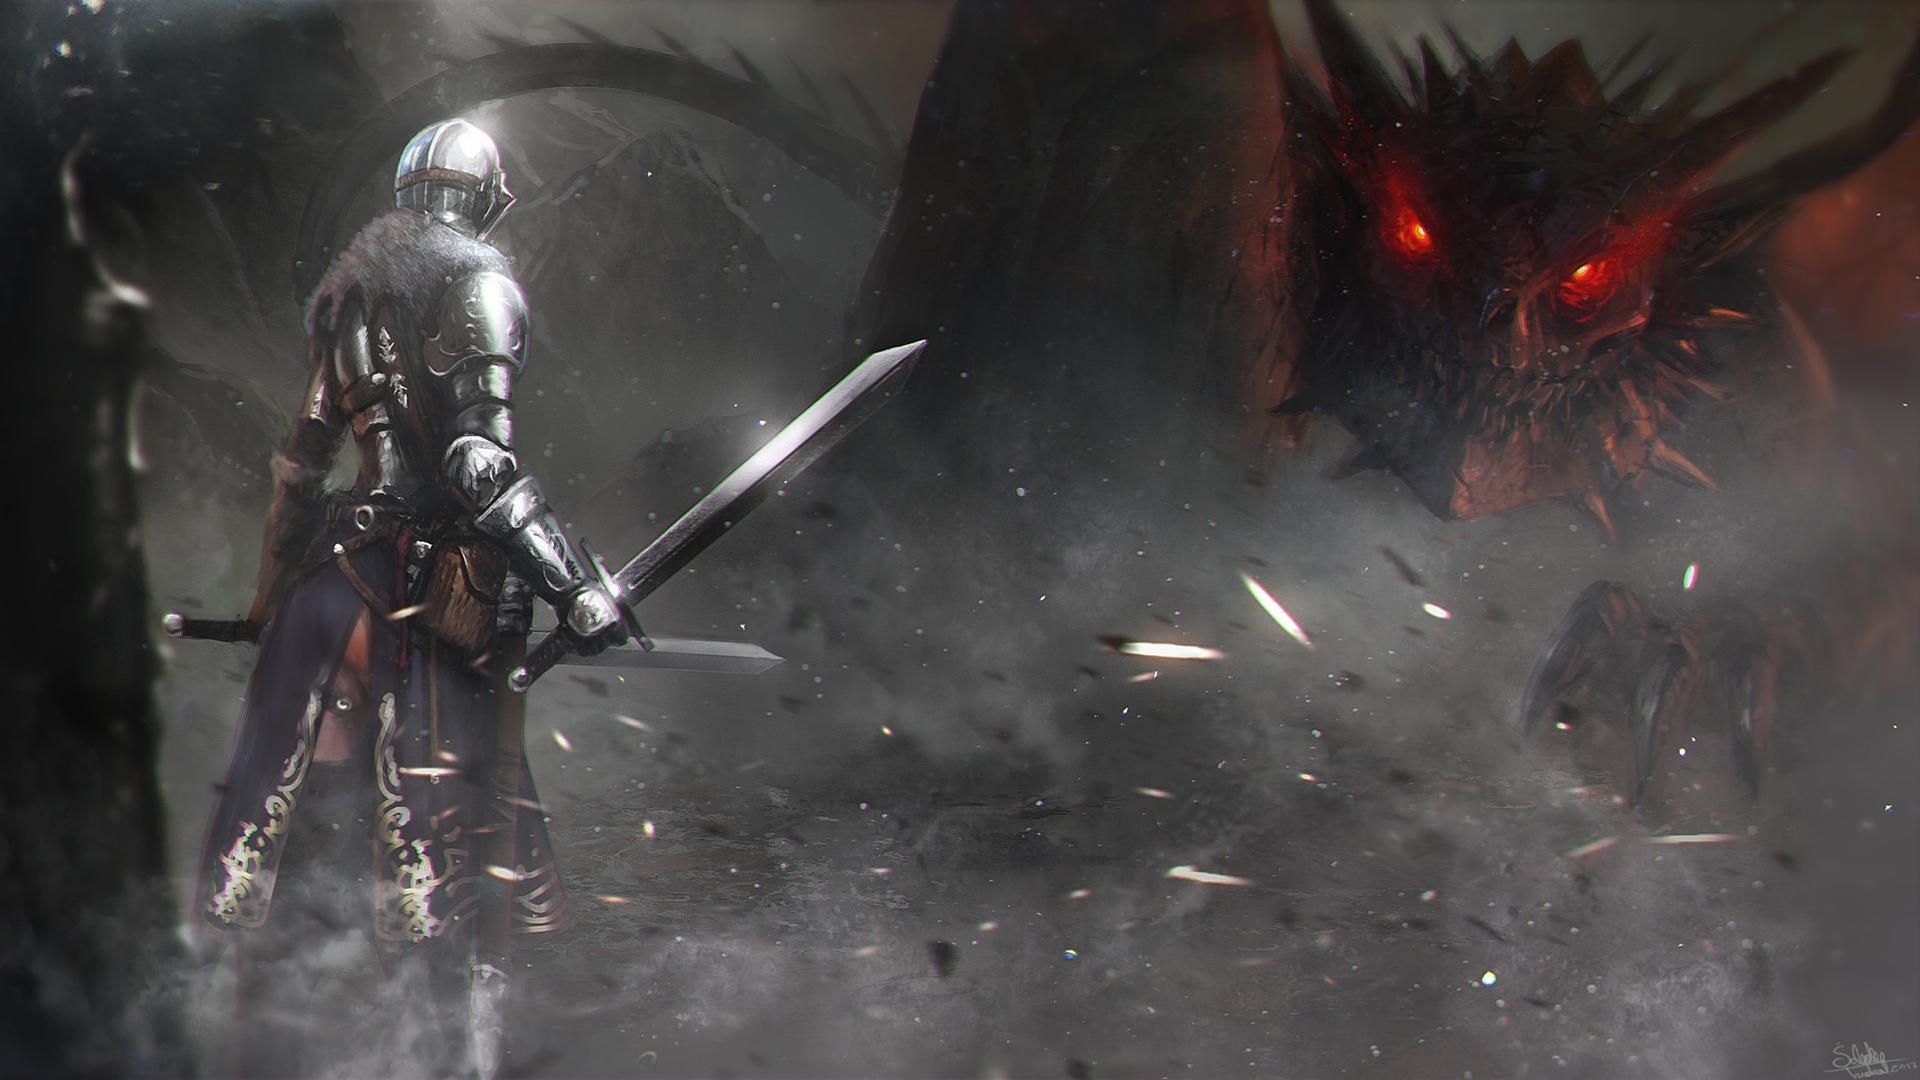 dark souls 2 II game dragon knight hd wallpaper image picture 1920x1080